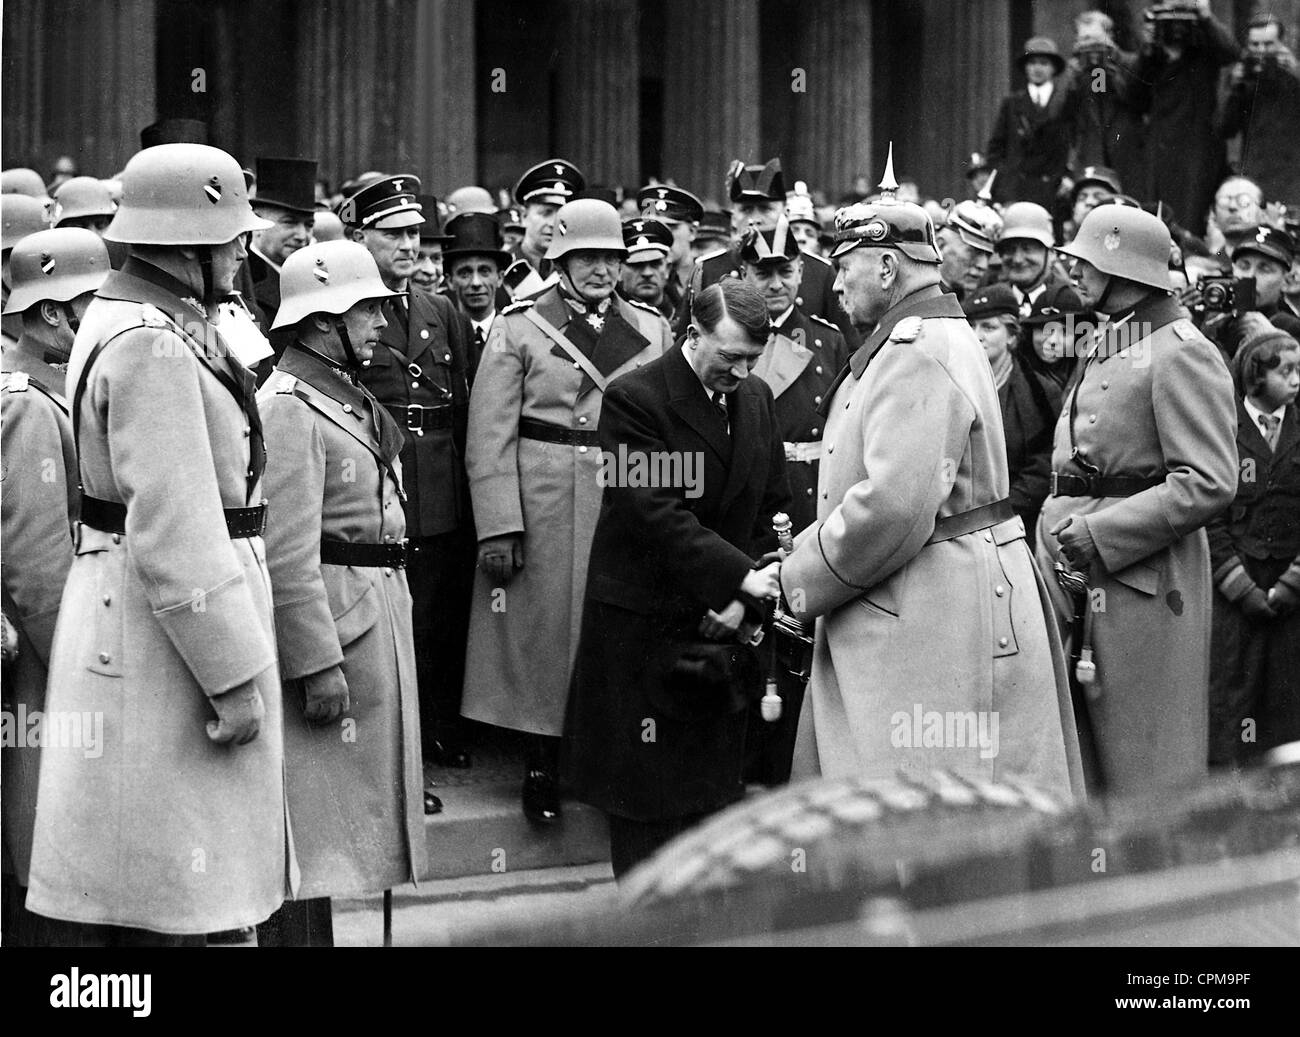 Adolf Hitler and Paul von Hindenburg on the Heldengedenktag (Heroes Memorial Day), 1934 - Stock Image